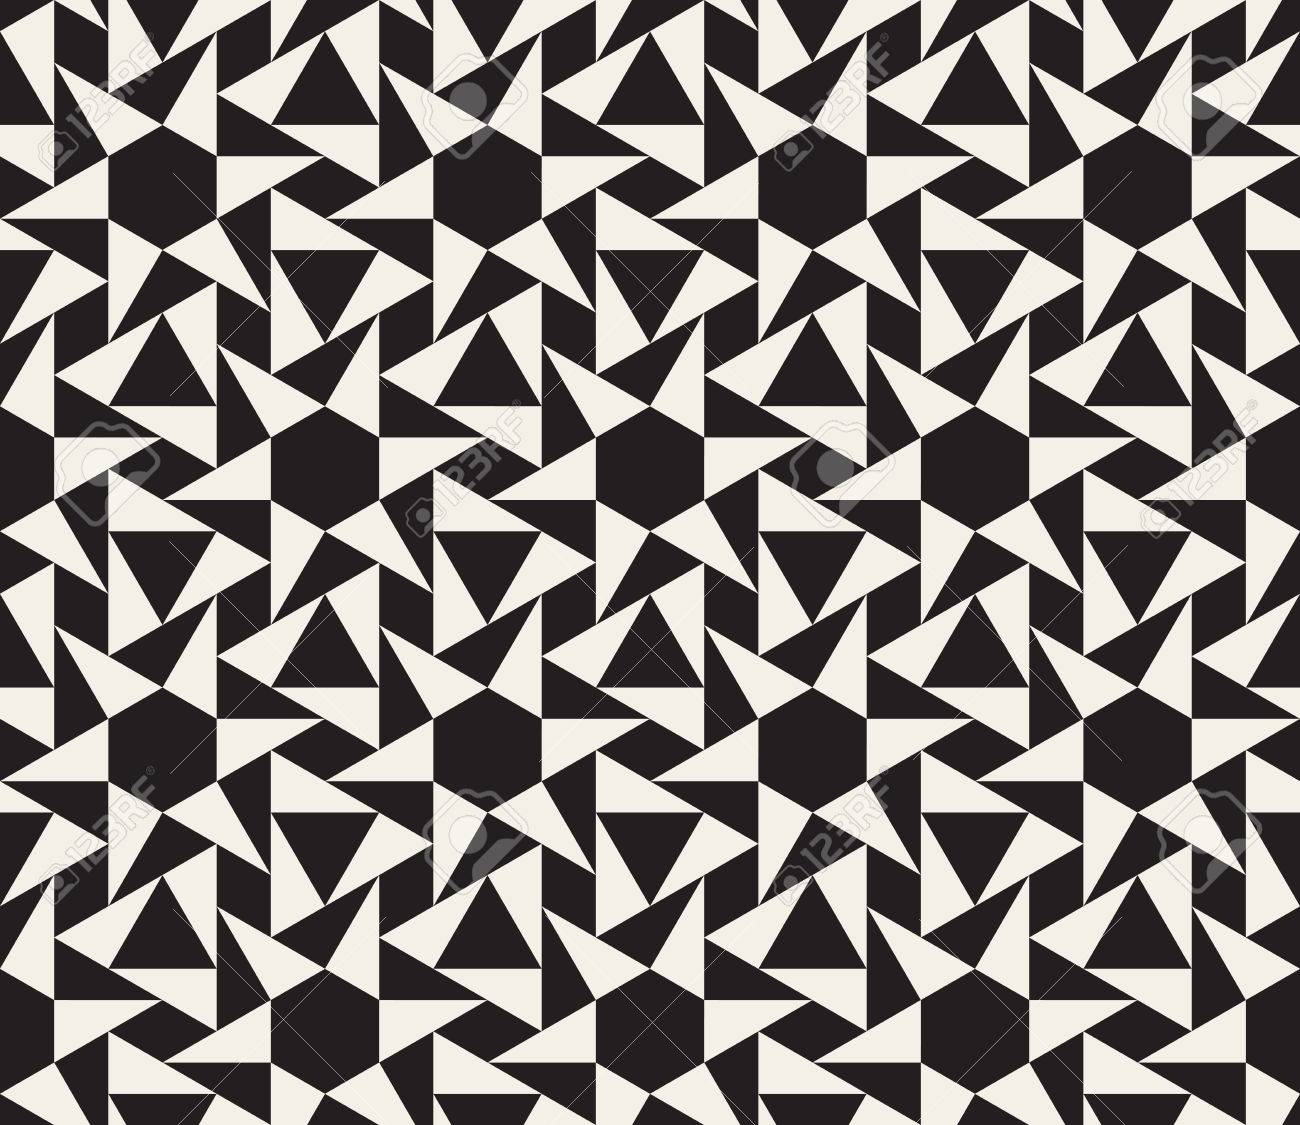 Seamless Black And White Geometric Tessellation Pattern Abstract